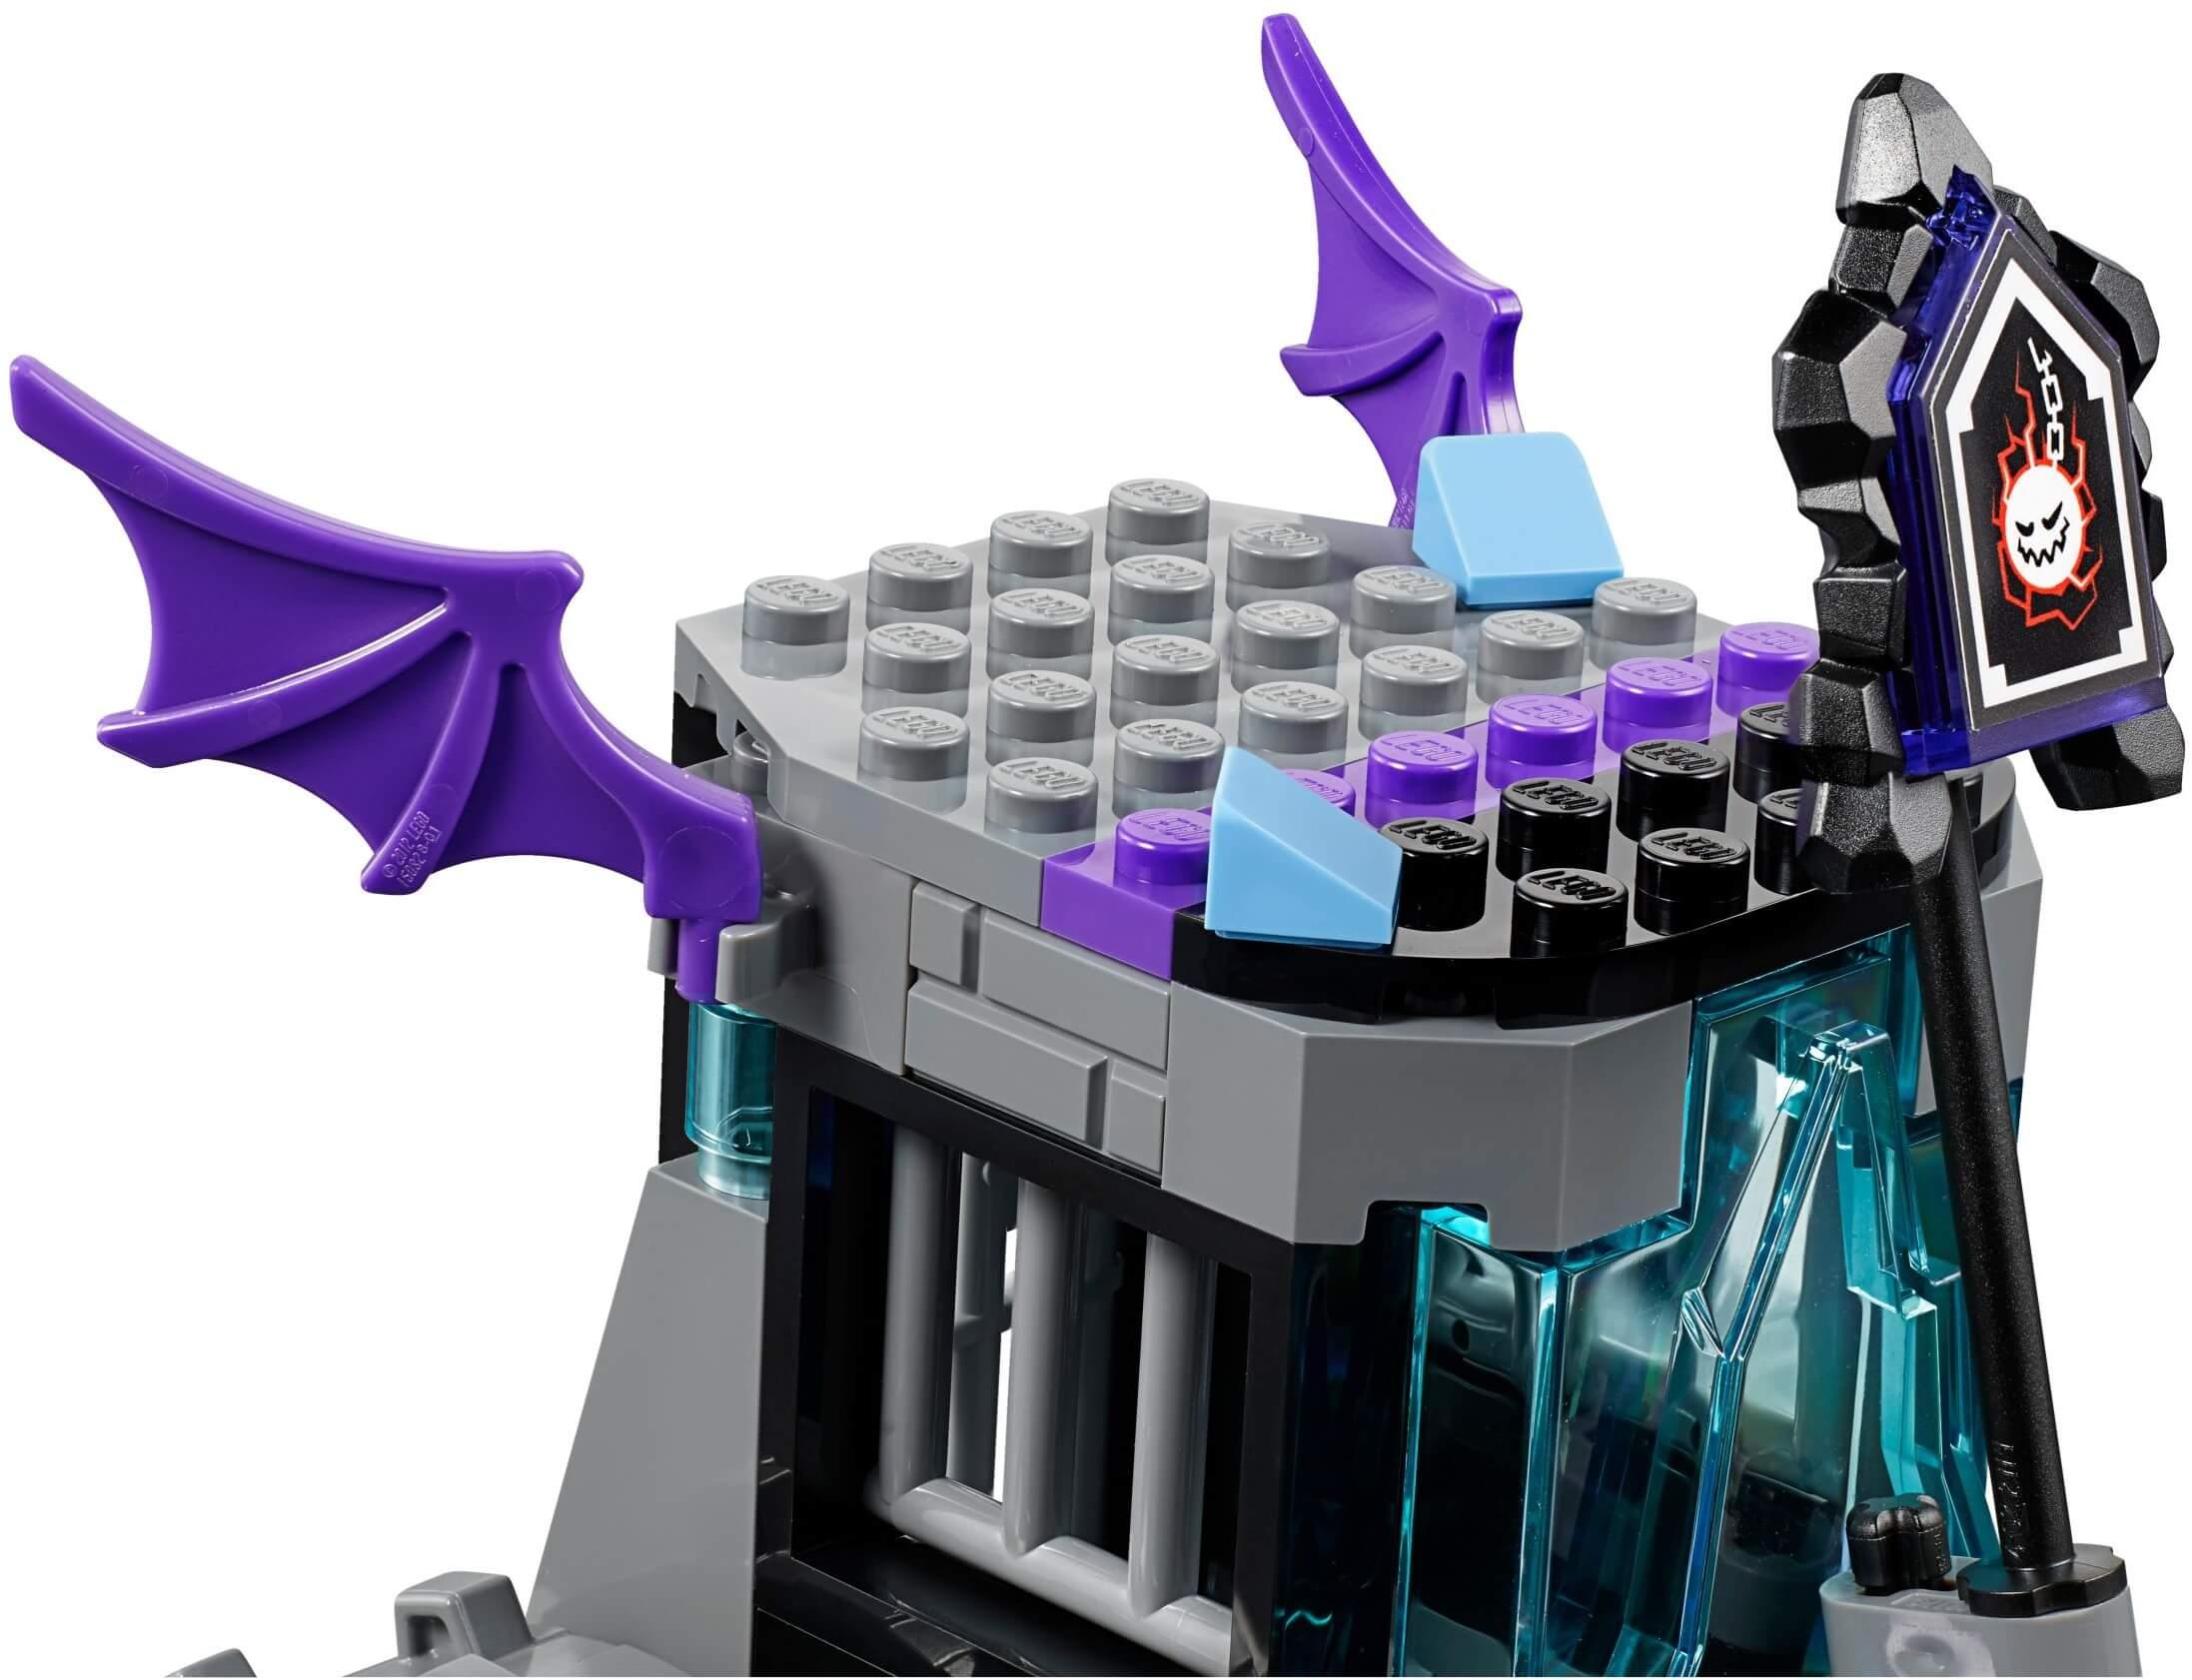 Mua đồ chơi LEGO 70349 - LEGO Nexo Knights 70349 - Cỗ Xe Quái Vật của Ruina (LEGO 70349 Ruina's Lock & Roller)